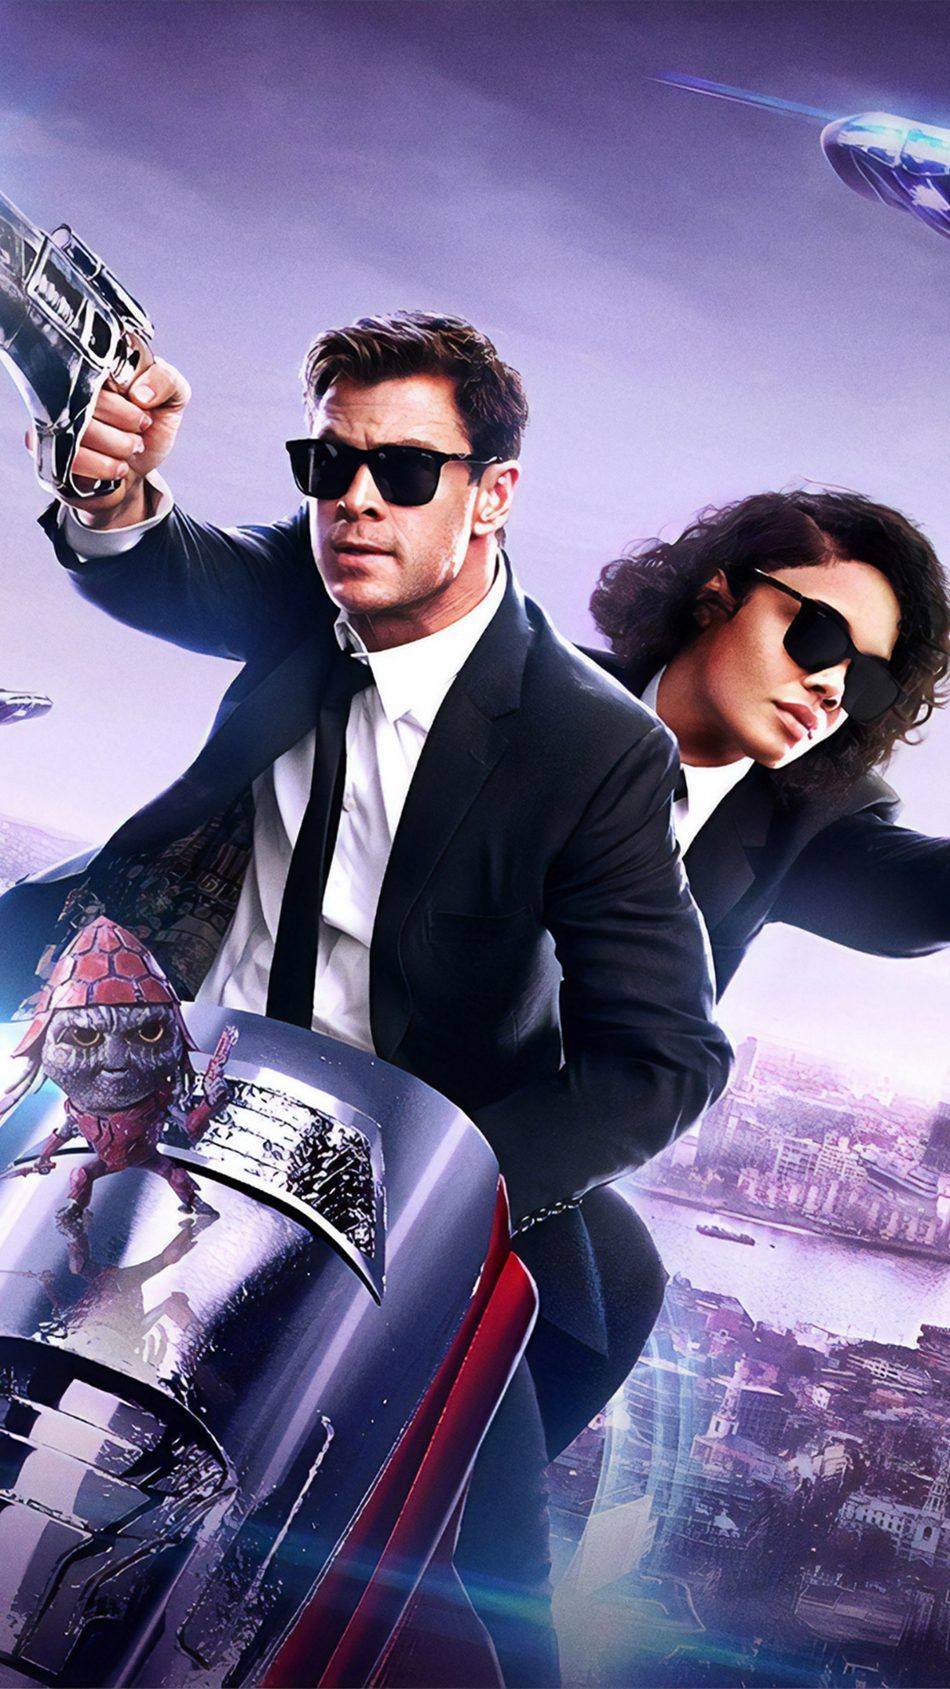 Chris Hemsworth Tessa Thompson In Men In Black International Chris Hemsworth Hemsworth Tessa Thompson